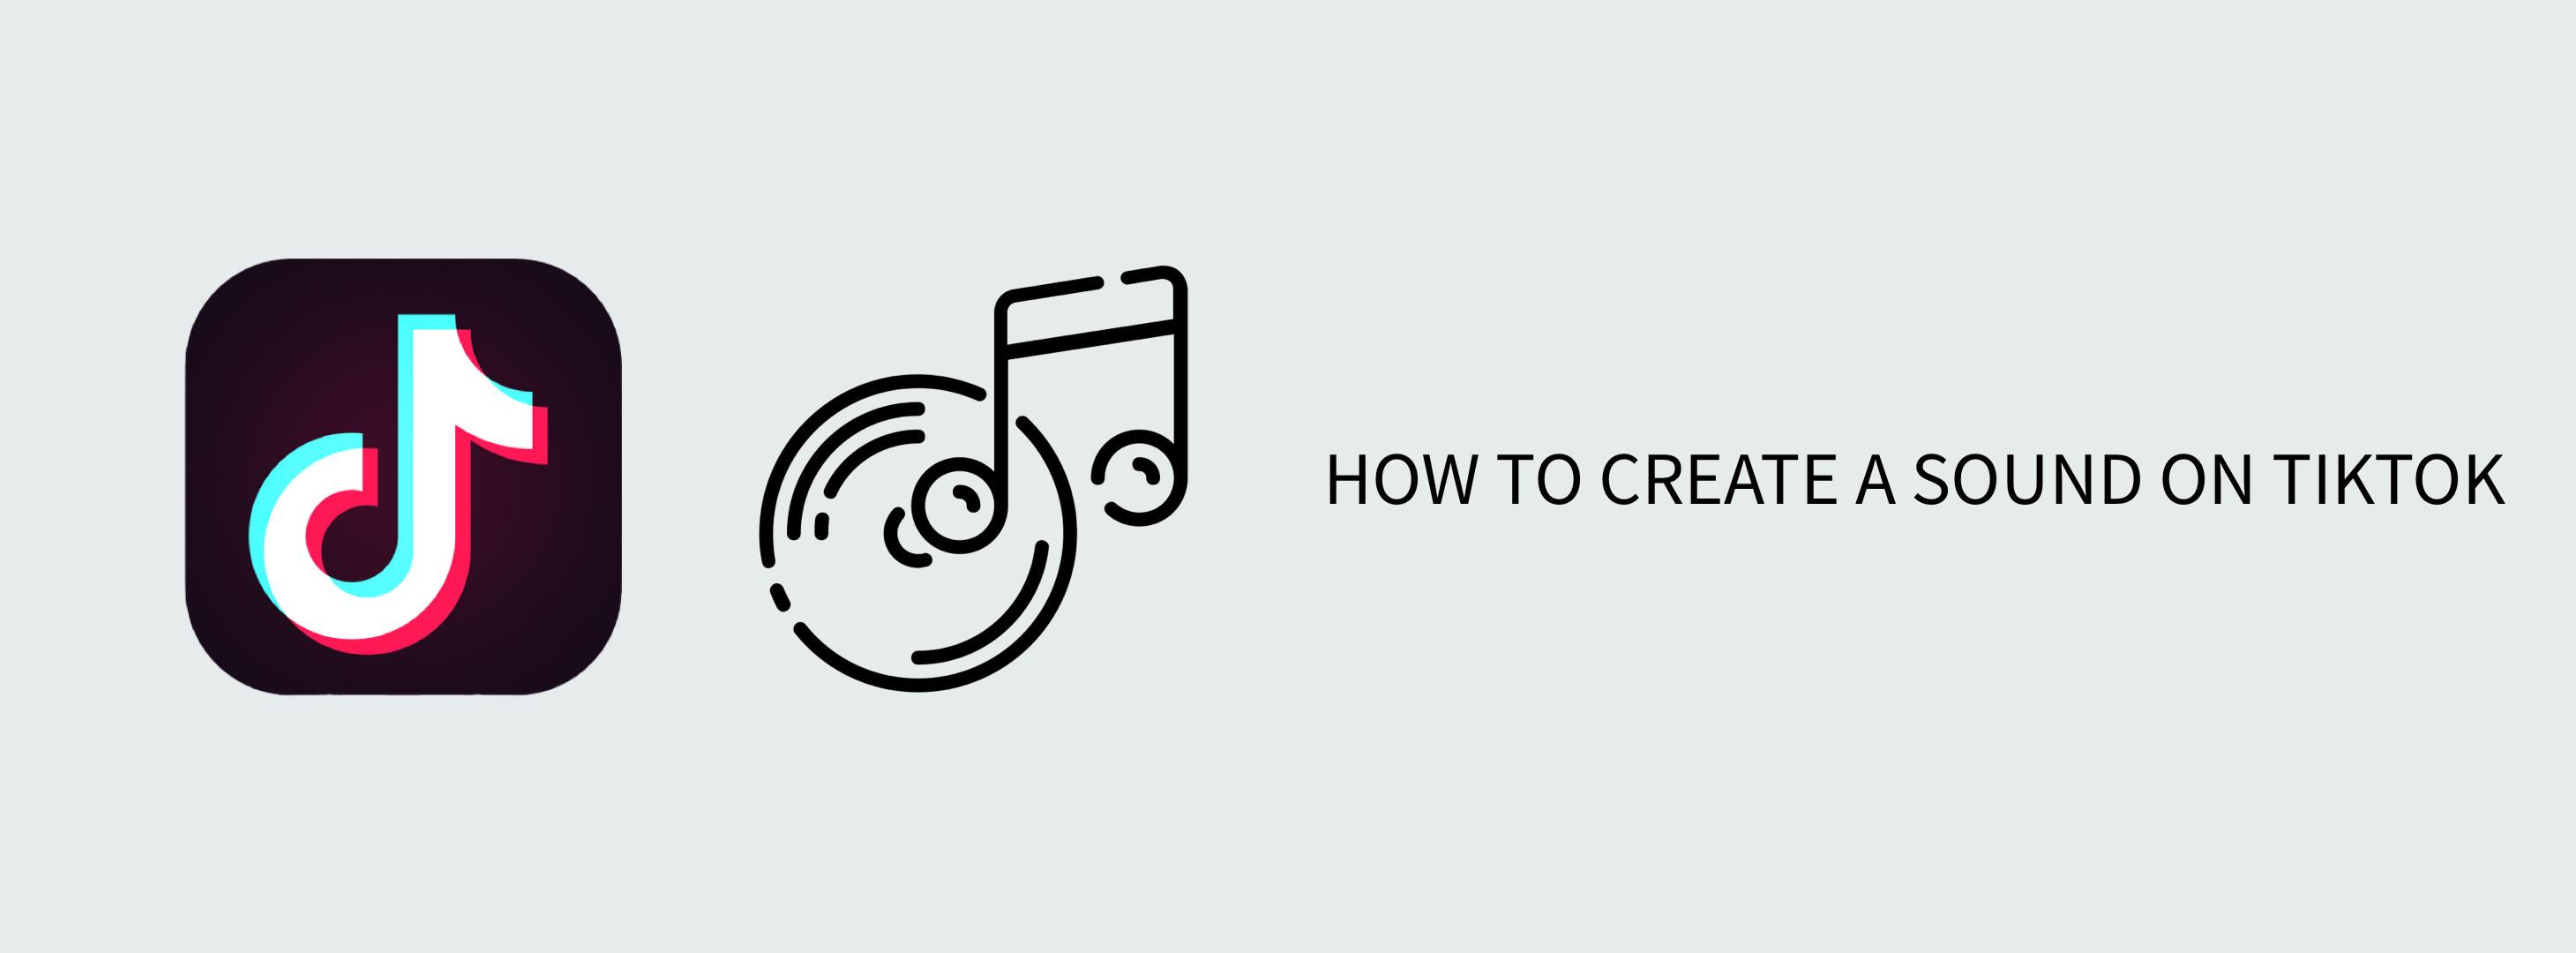 allapplenews-create-sound-tiktok